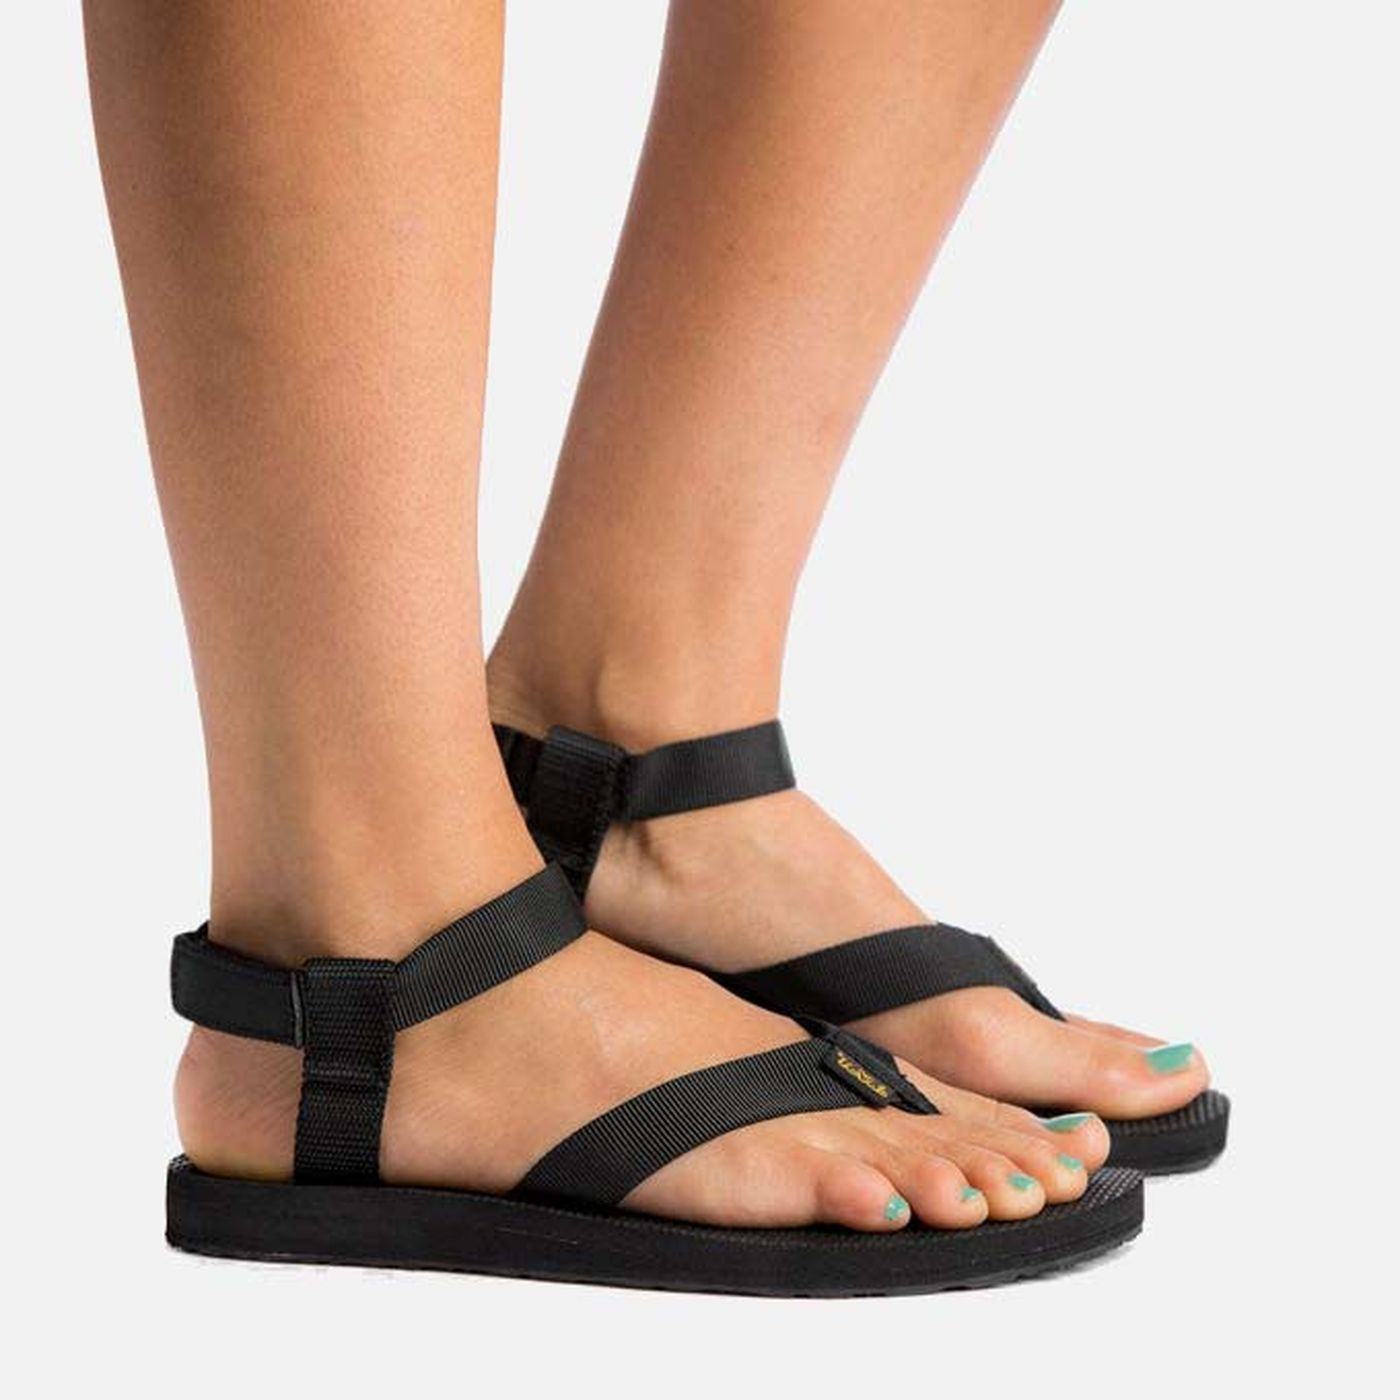 Free Shipping & Free Returns on Authentic Teva® Women's Original Sandal  sandals. Shop our